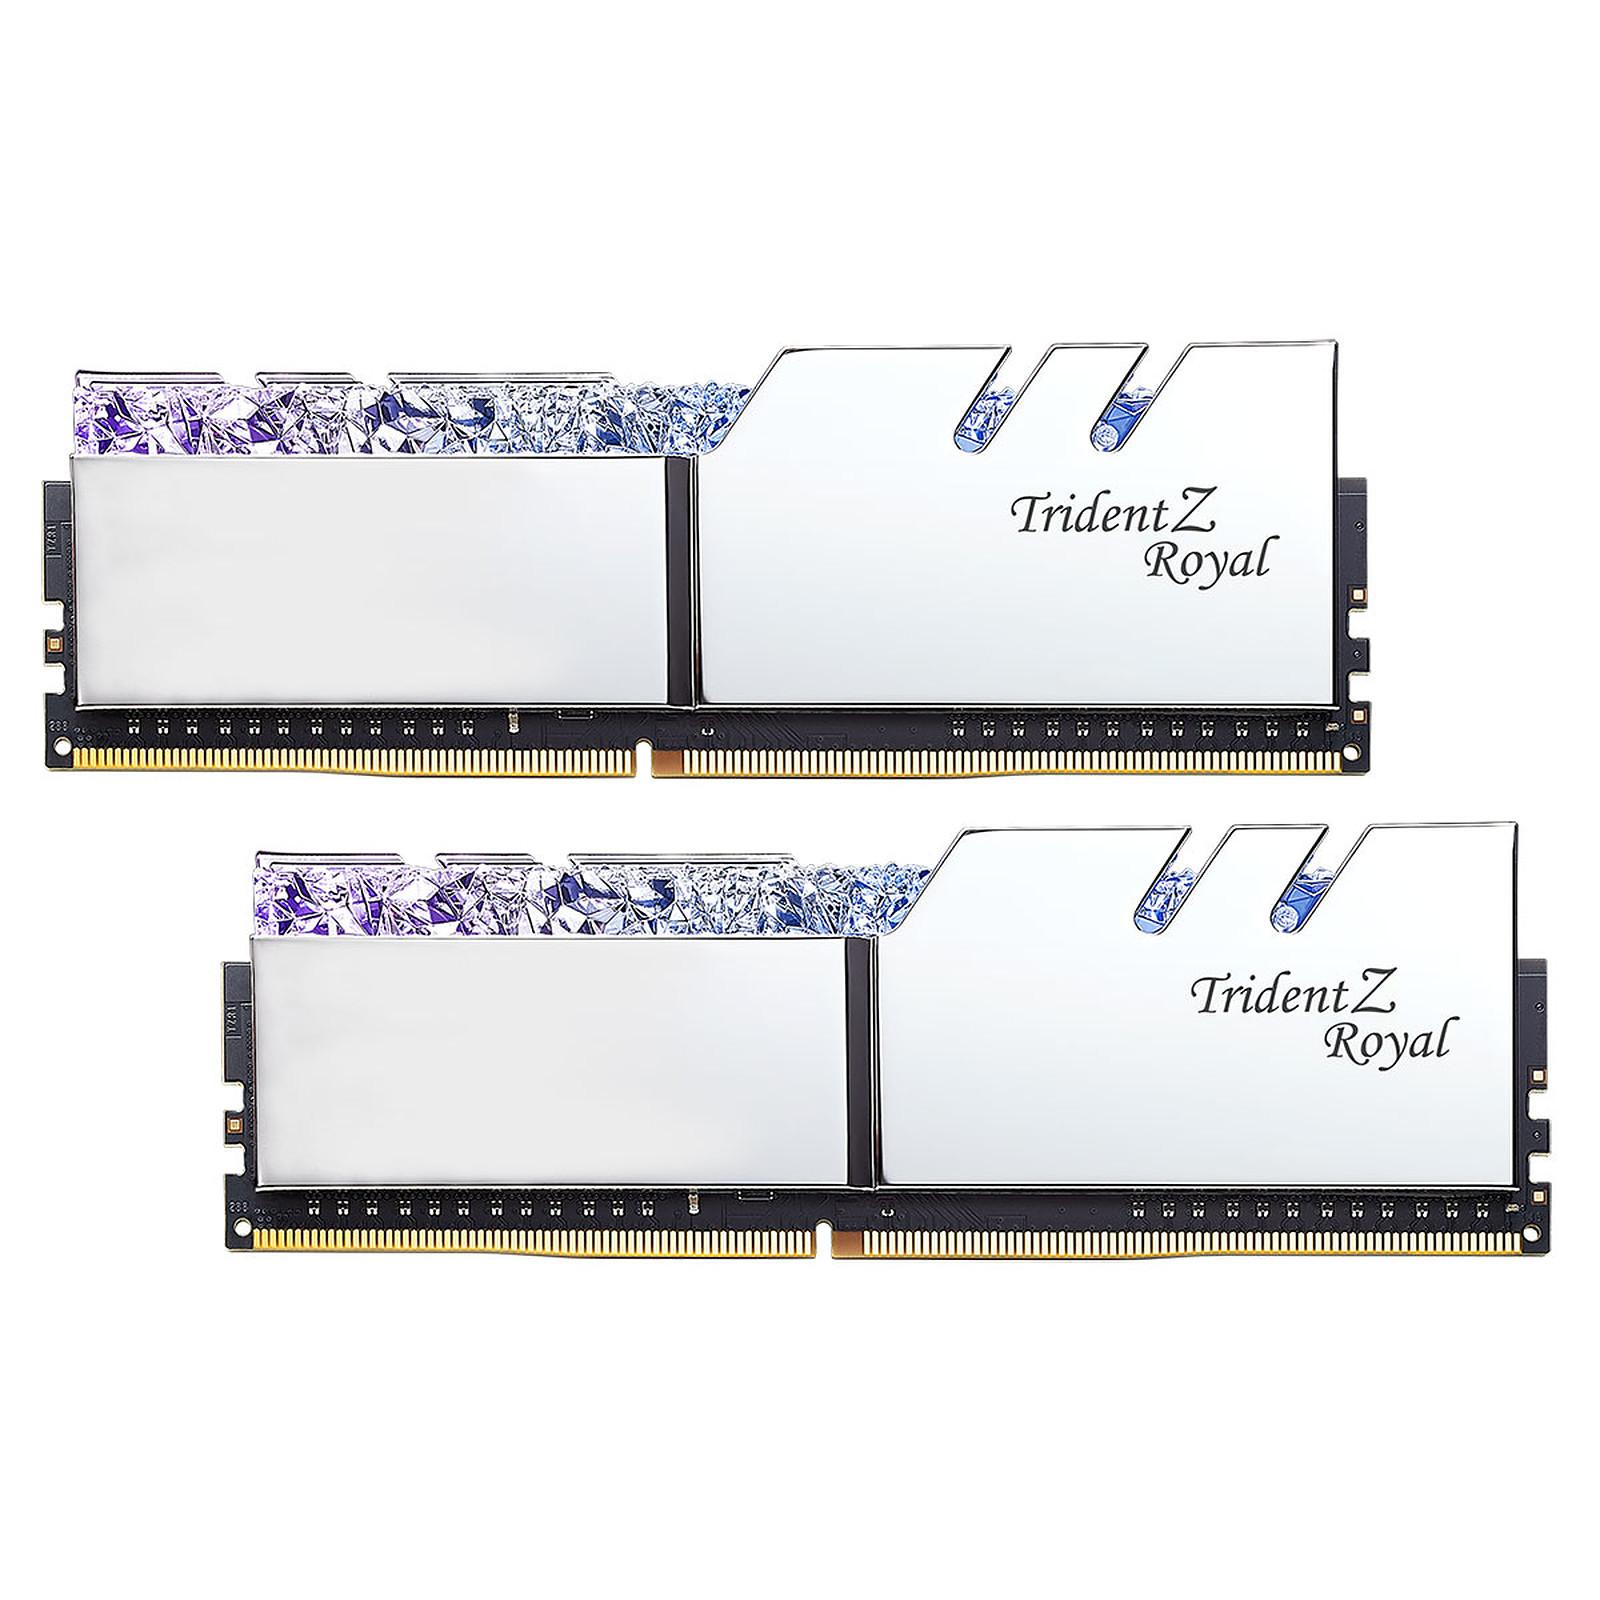 G.Skill Trident Z Royal 16 GB (2 x 8 GB) DDR4 4000 MHz CL17 - Plata